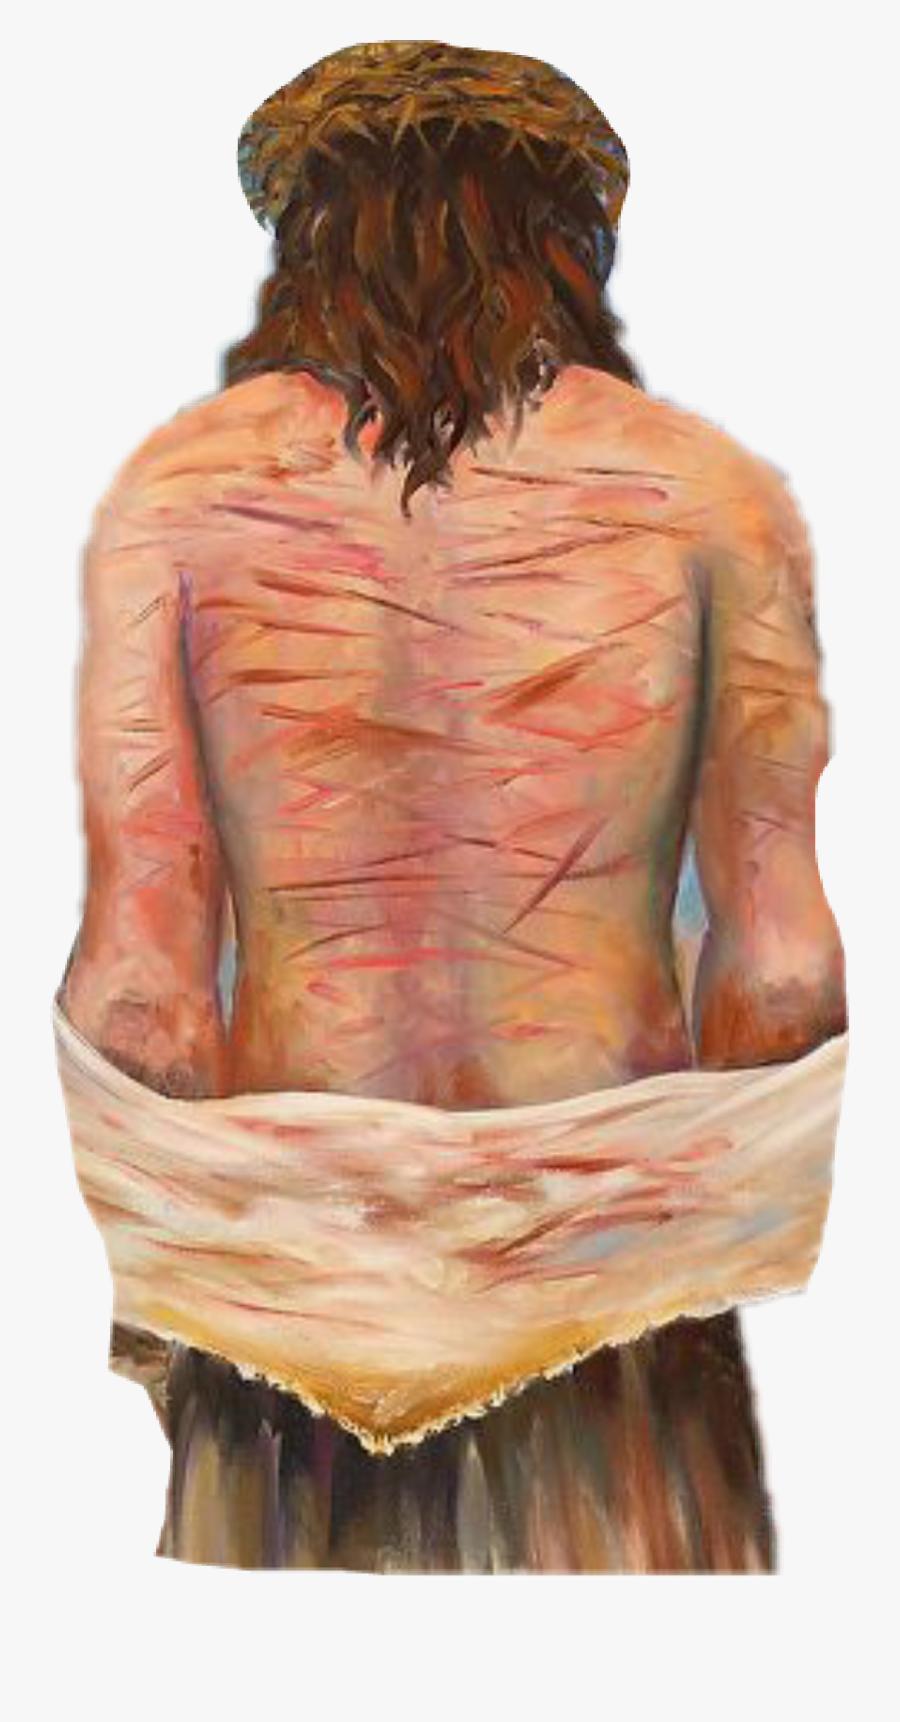 Transparent Cool Jesus Png - Jesus Stripped Of Clothes, Transparent Clipart